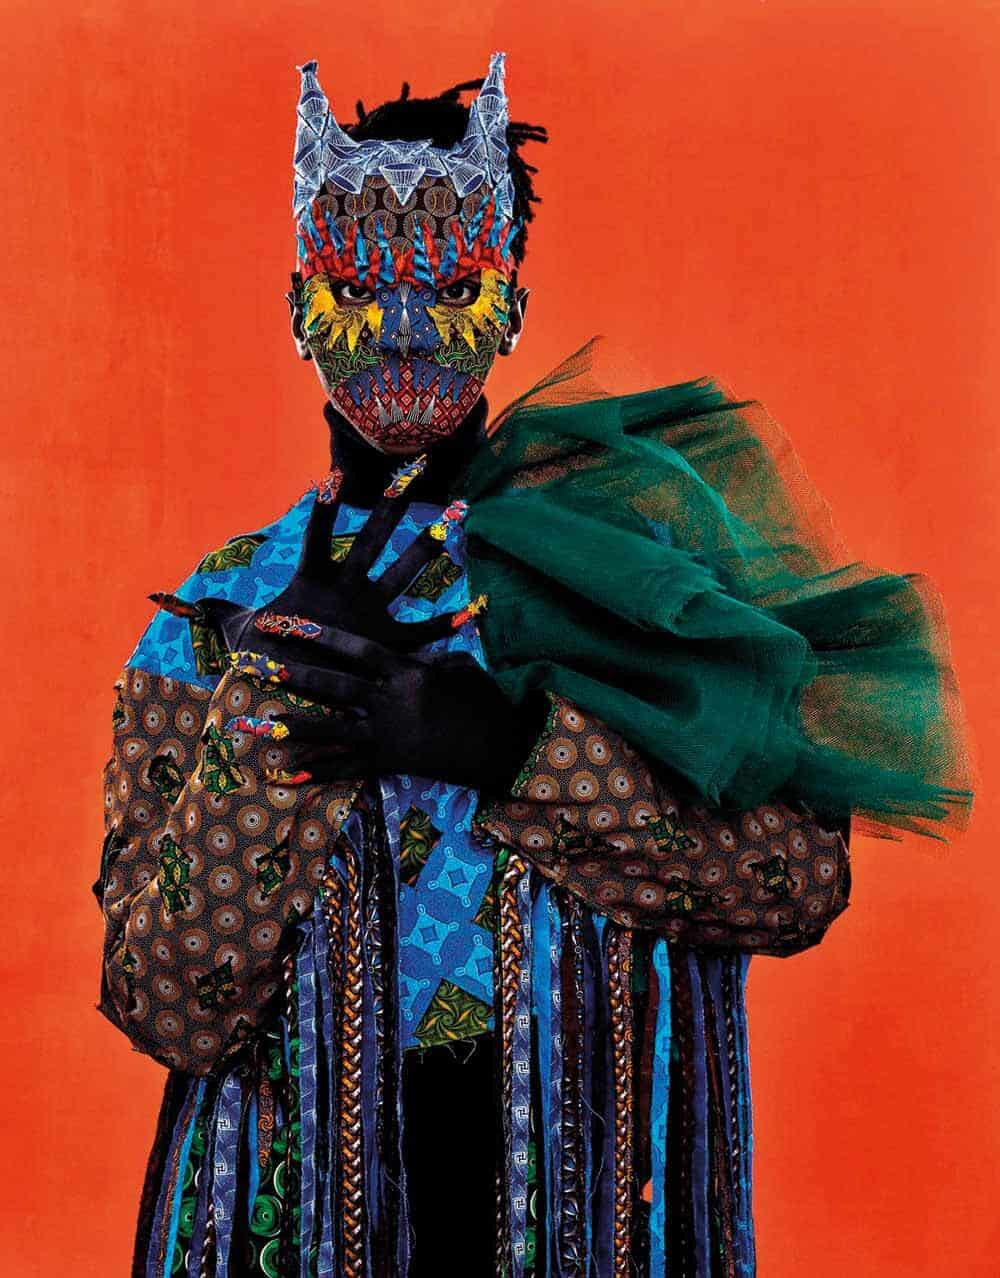 Portrait of Siwa Mgoboza by Gerda Genis. Courtsey of Semaphore Gallery.